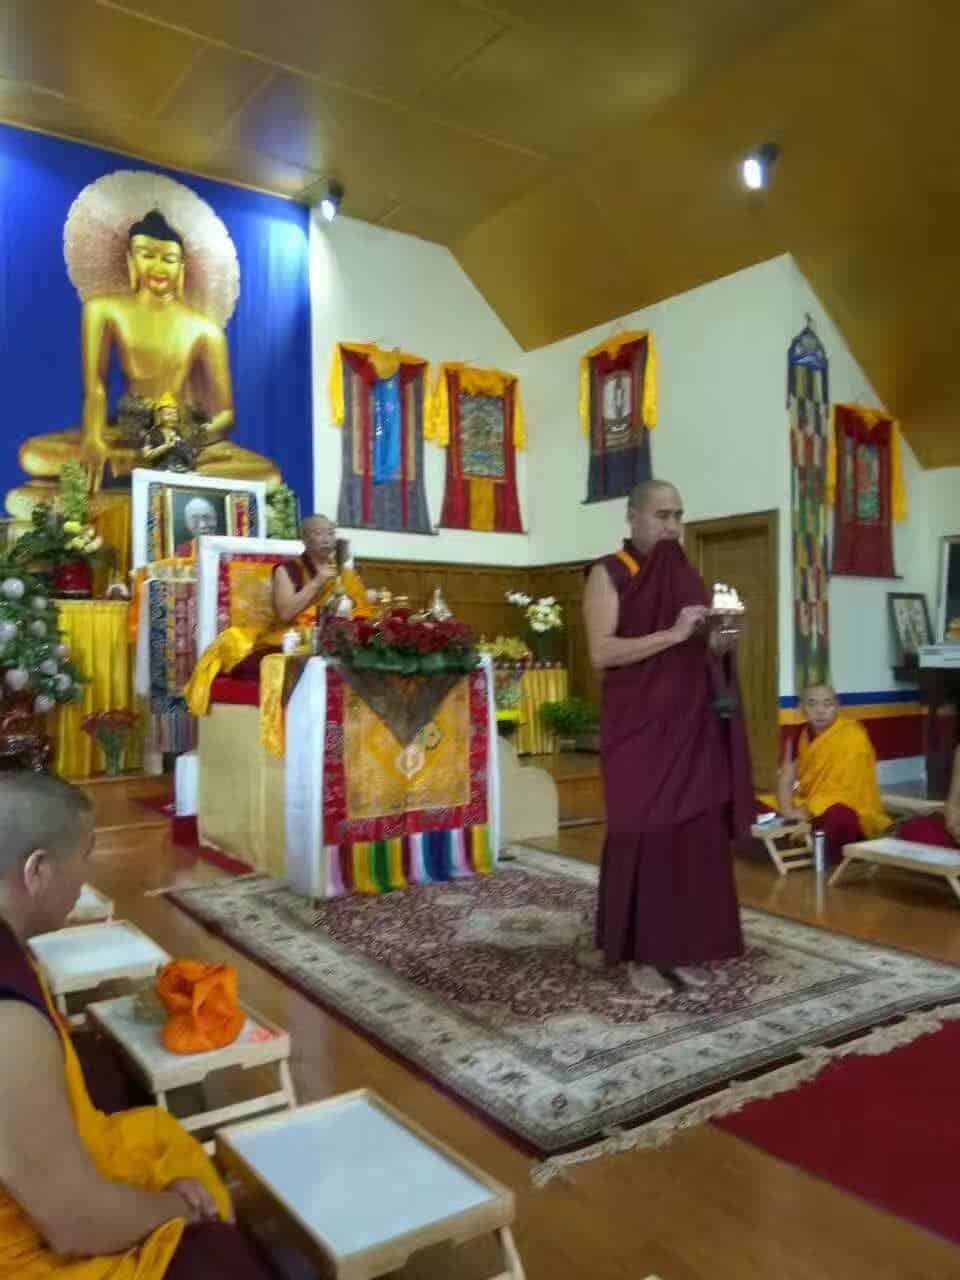 Gosok Rinpoche Toronto 2017-04 005 9067f5bf00a242d886a99806db3231f